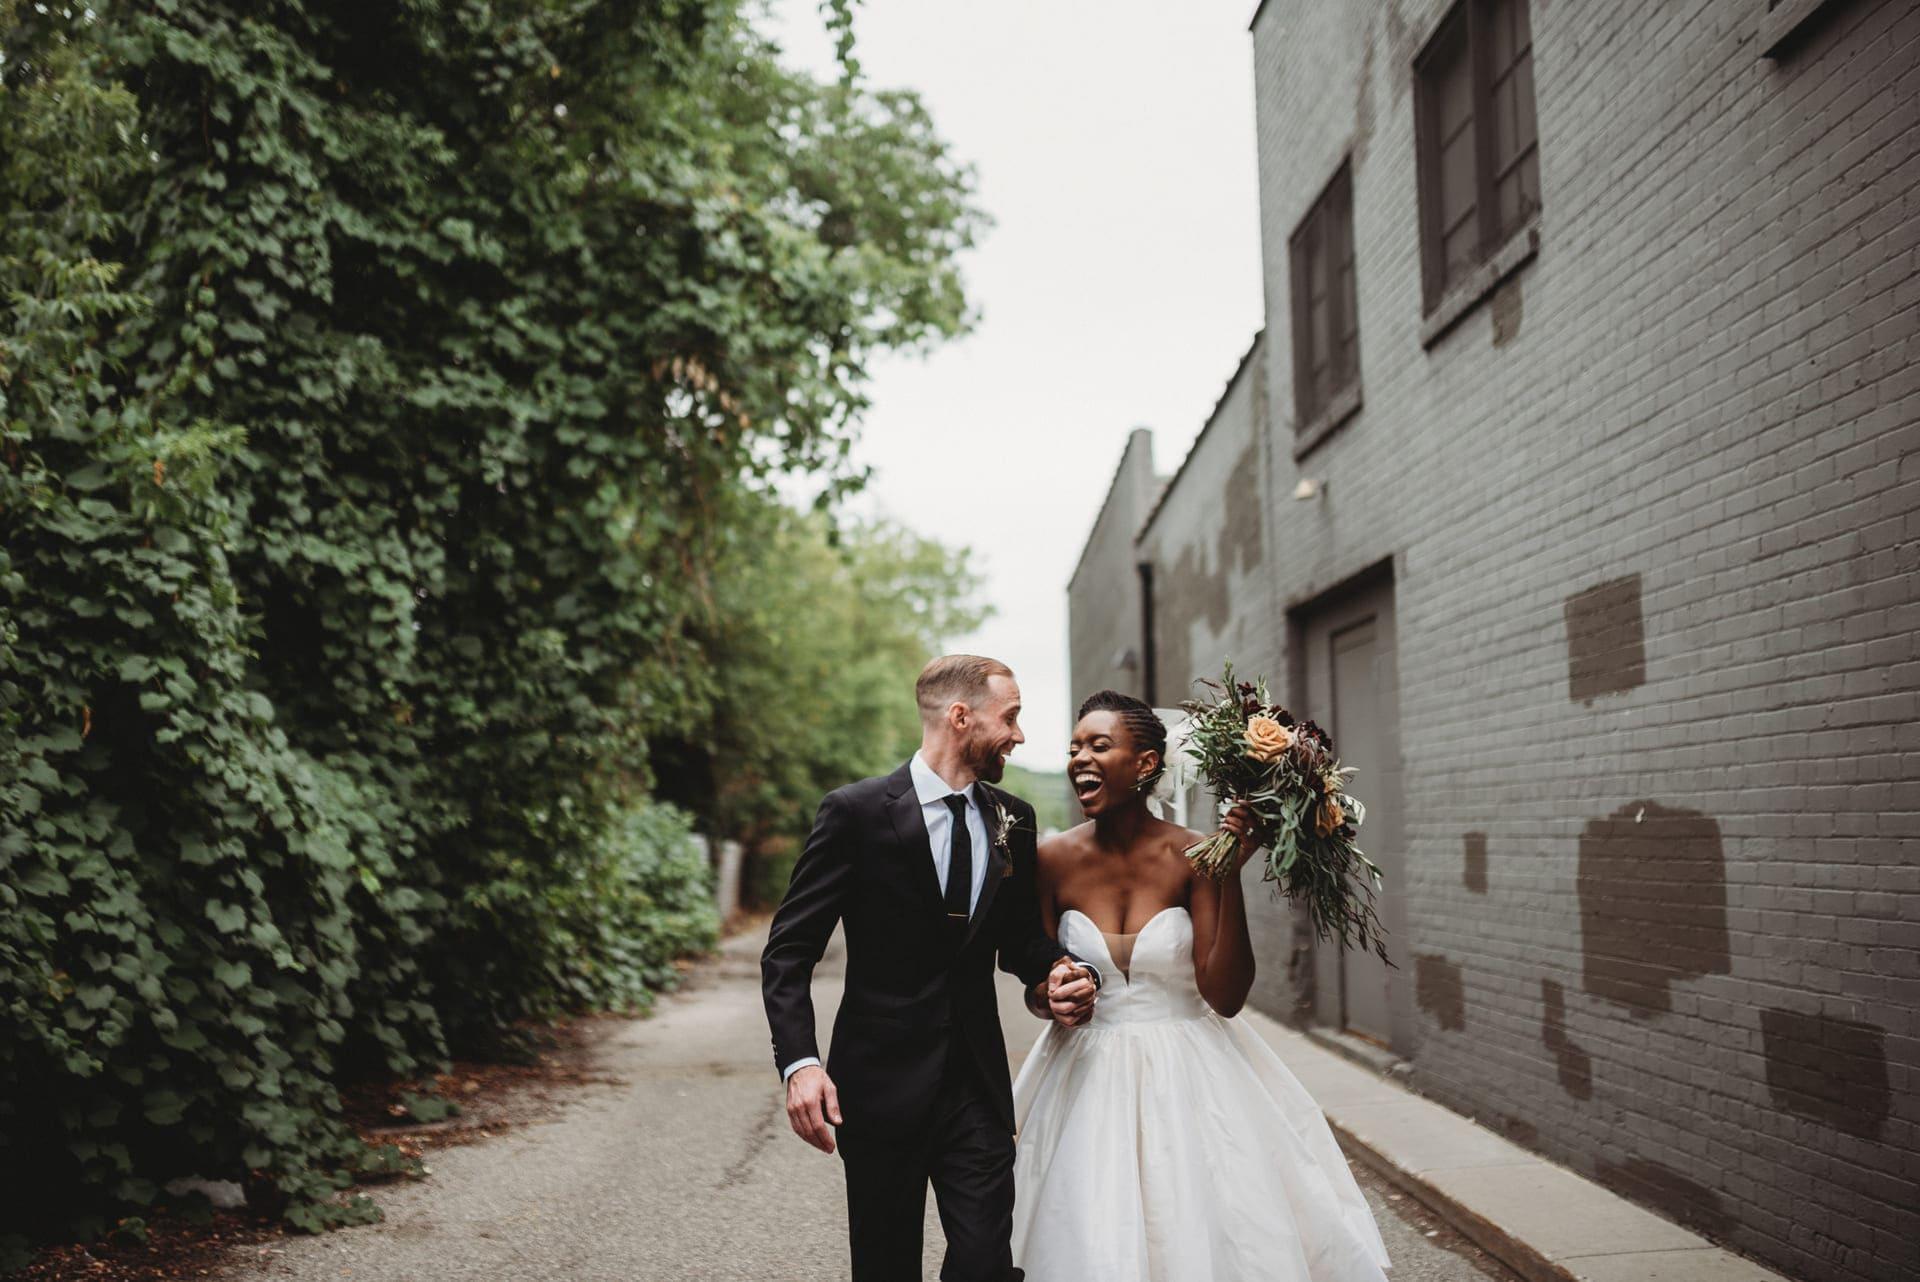 Brides Smile Richland Michigan Wedding Photography